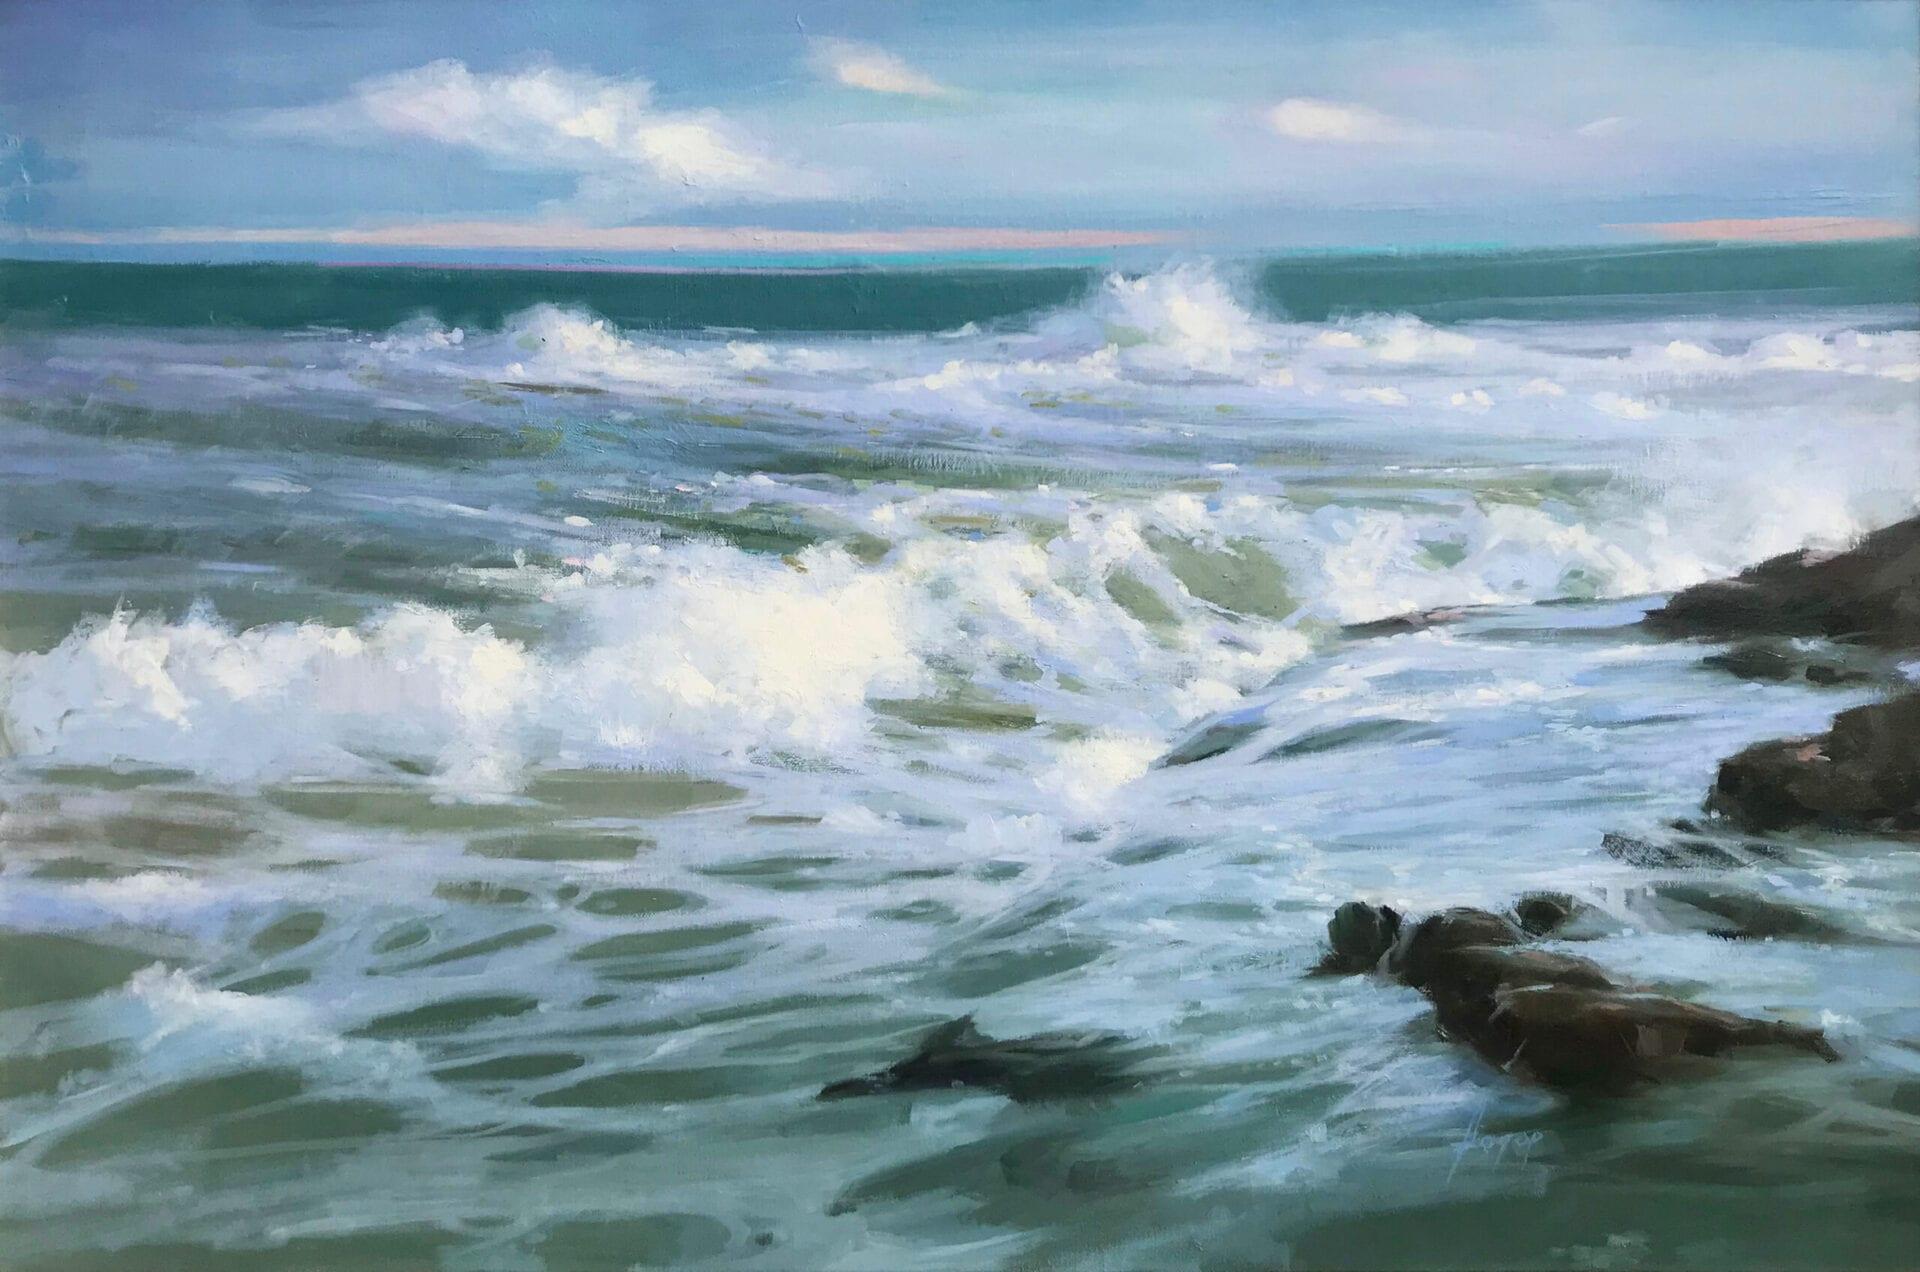 Hagop Keledjian - Sounds of the Sea